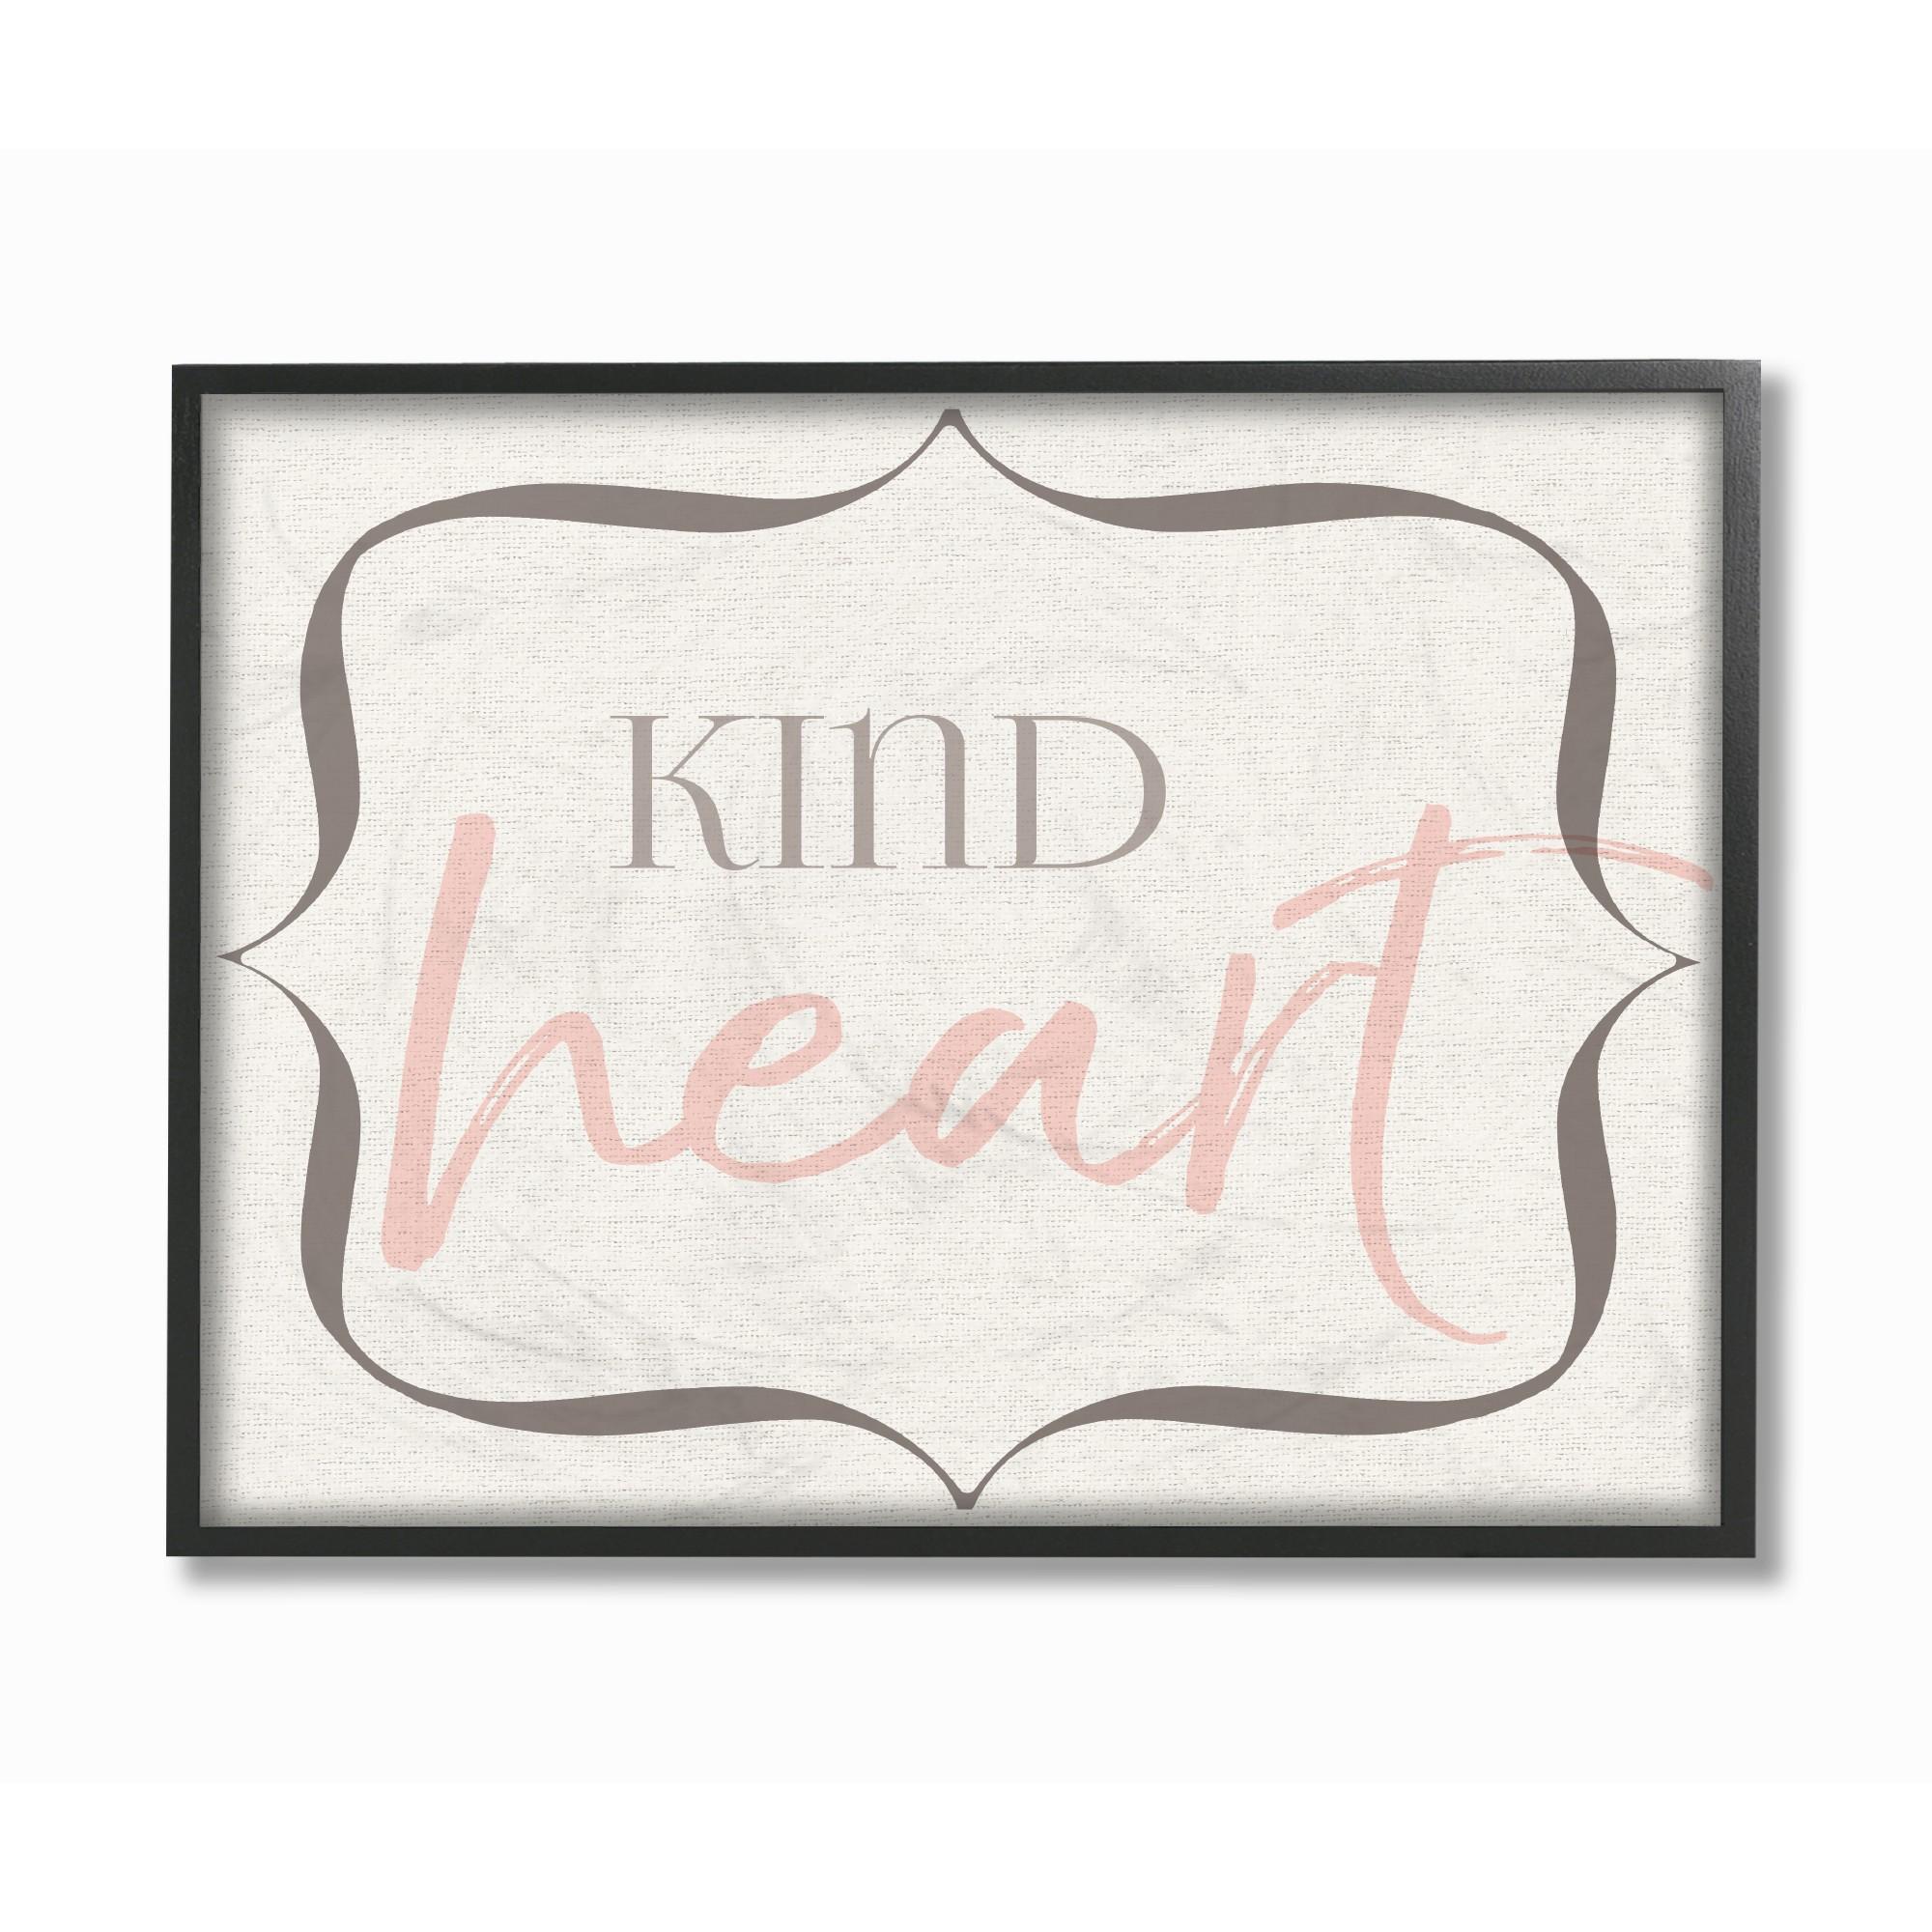 The Kids Room by Stupell Elegant Kind Heart Framed Giclee Texturized Art, 11 x 1.5 x 14